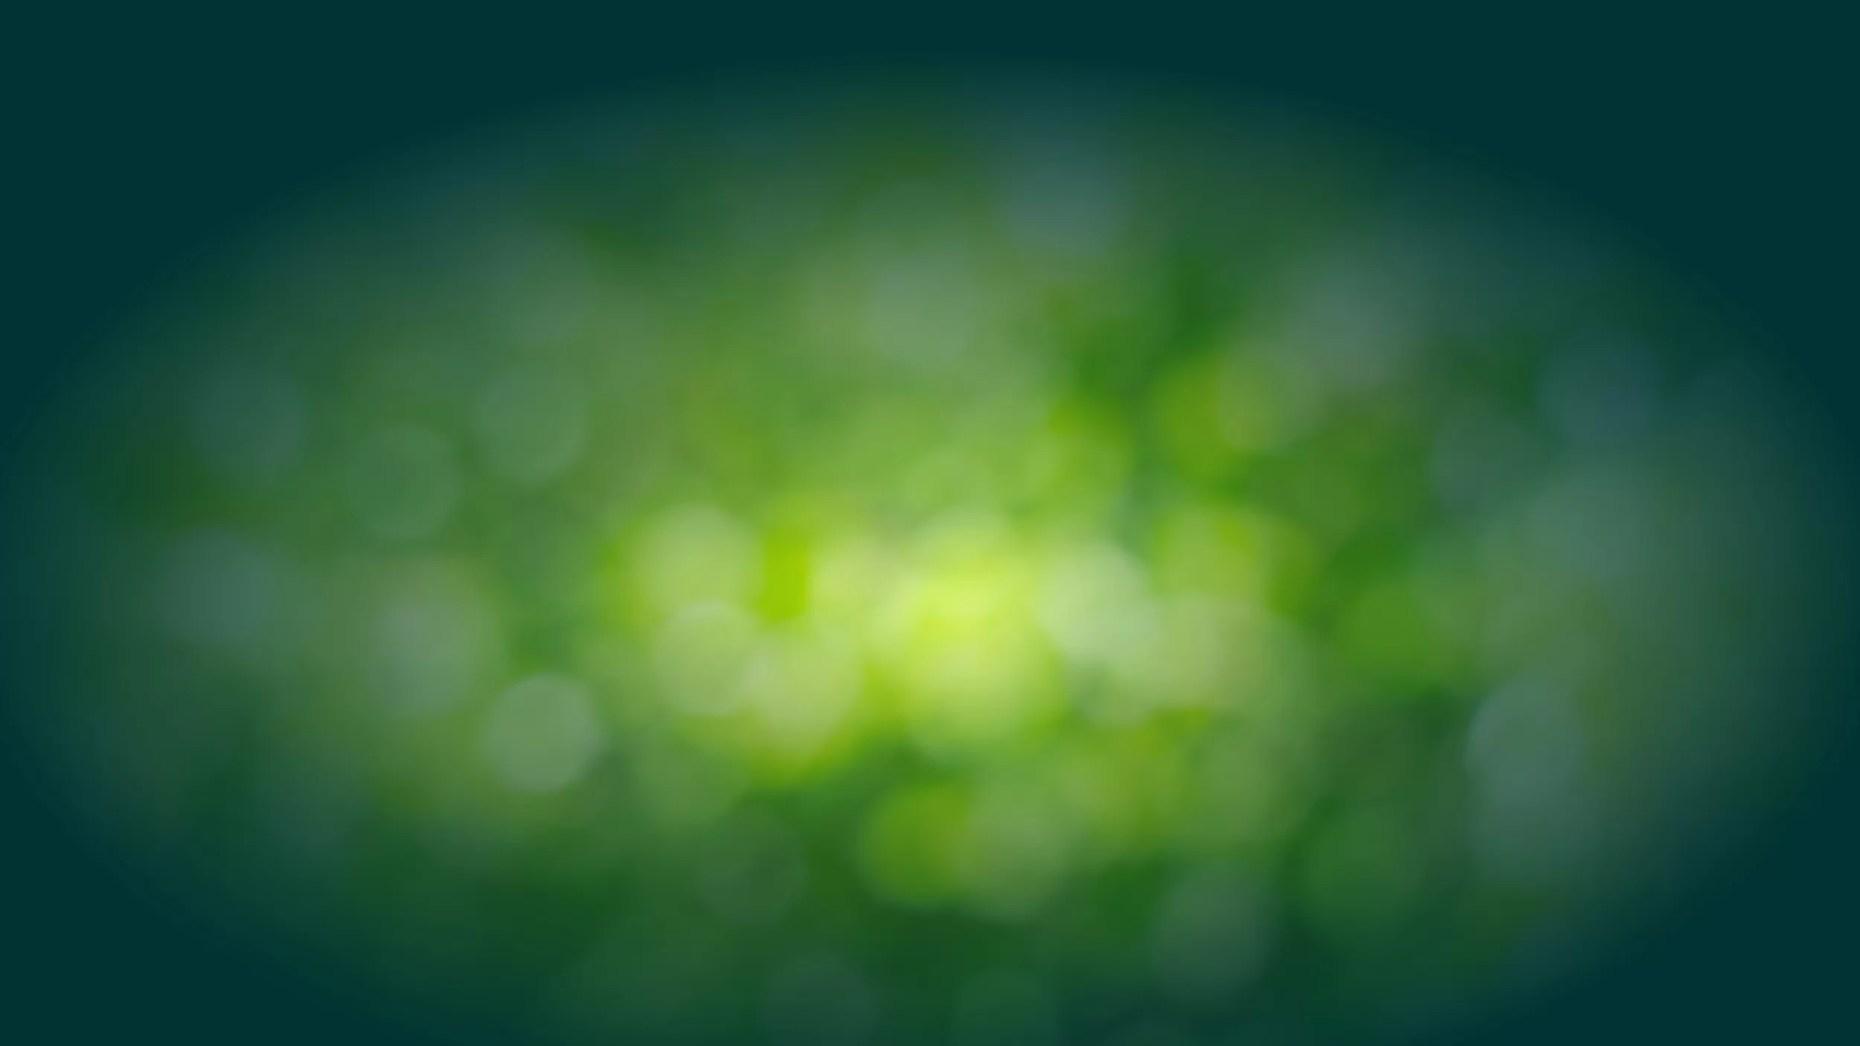 Green Ligth Background